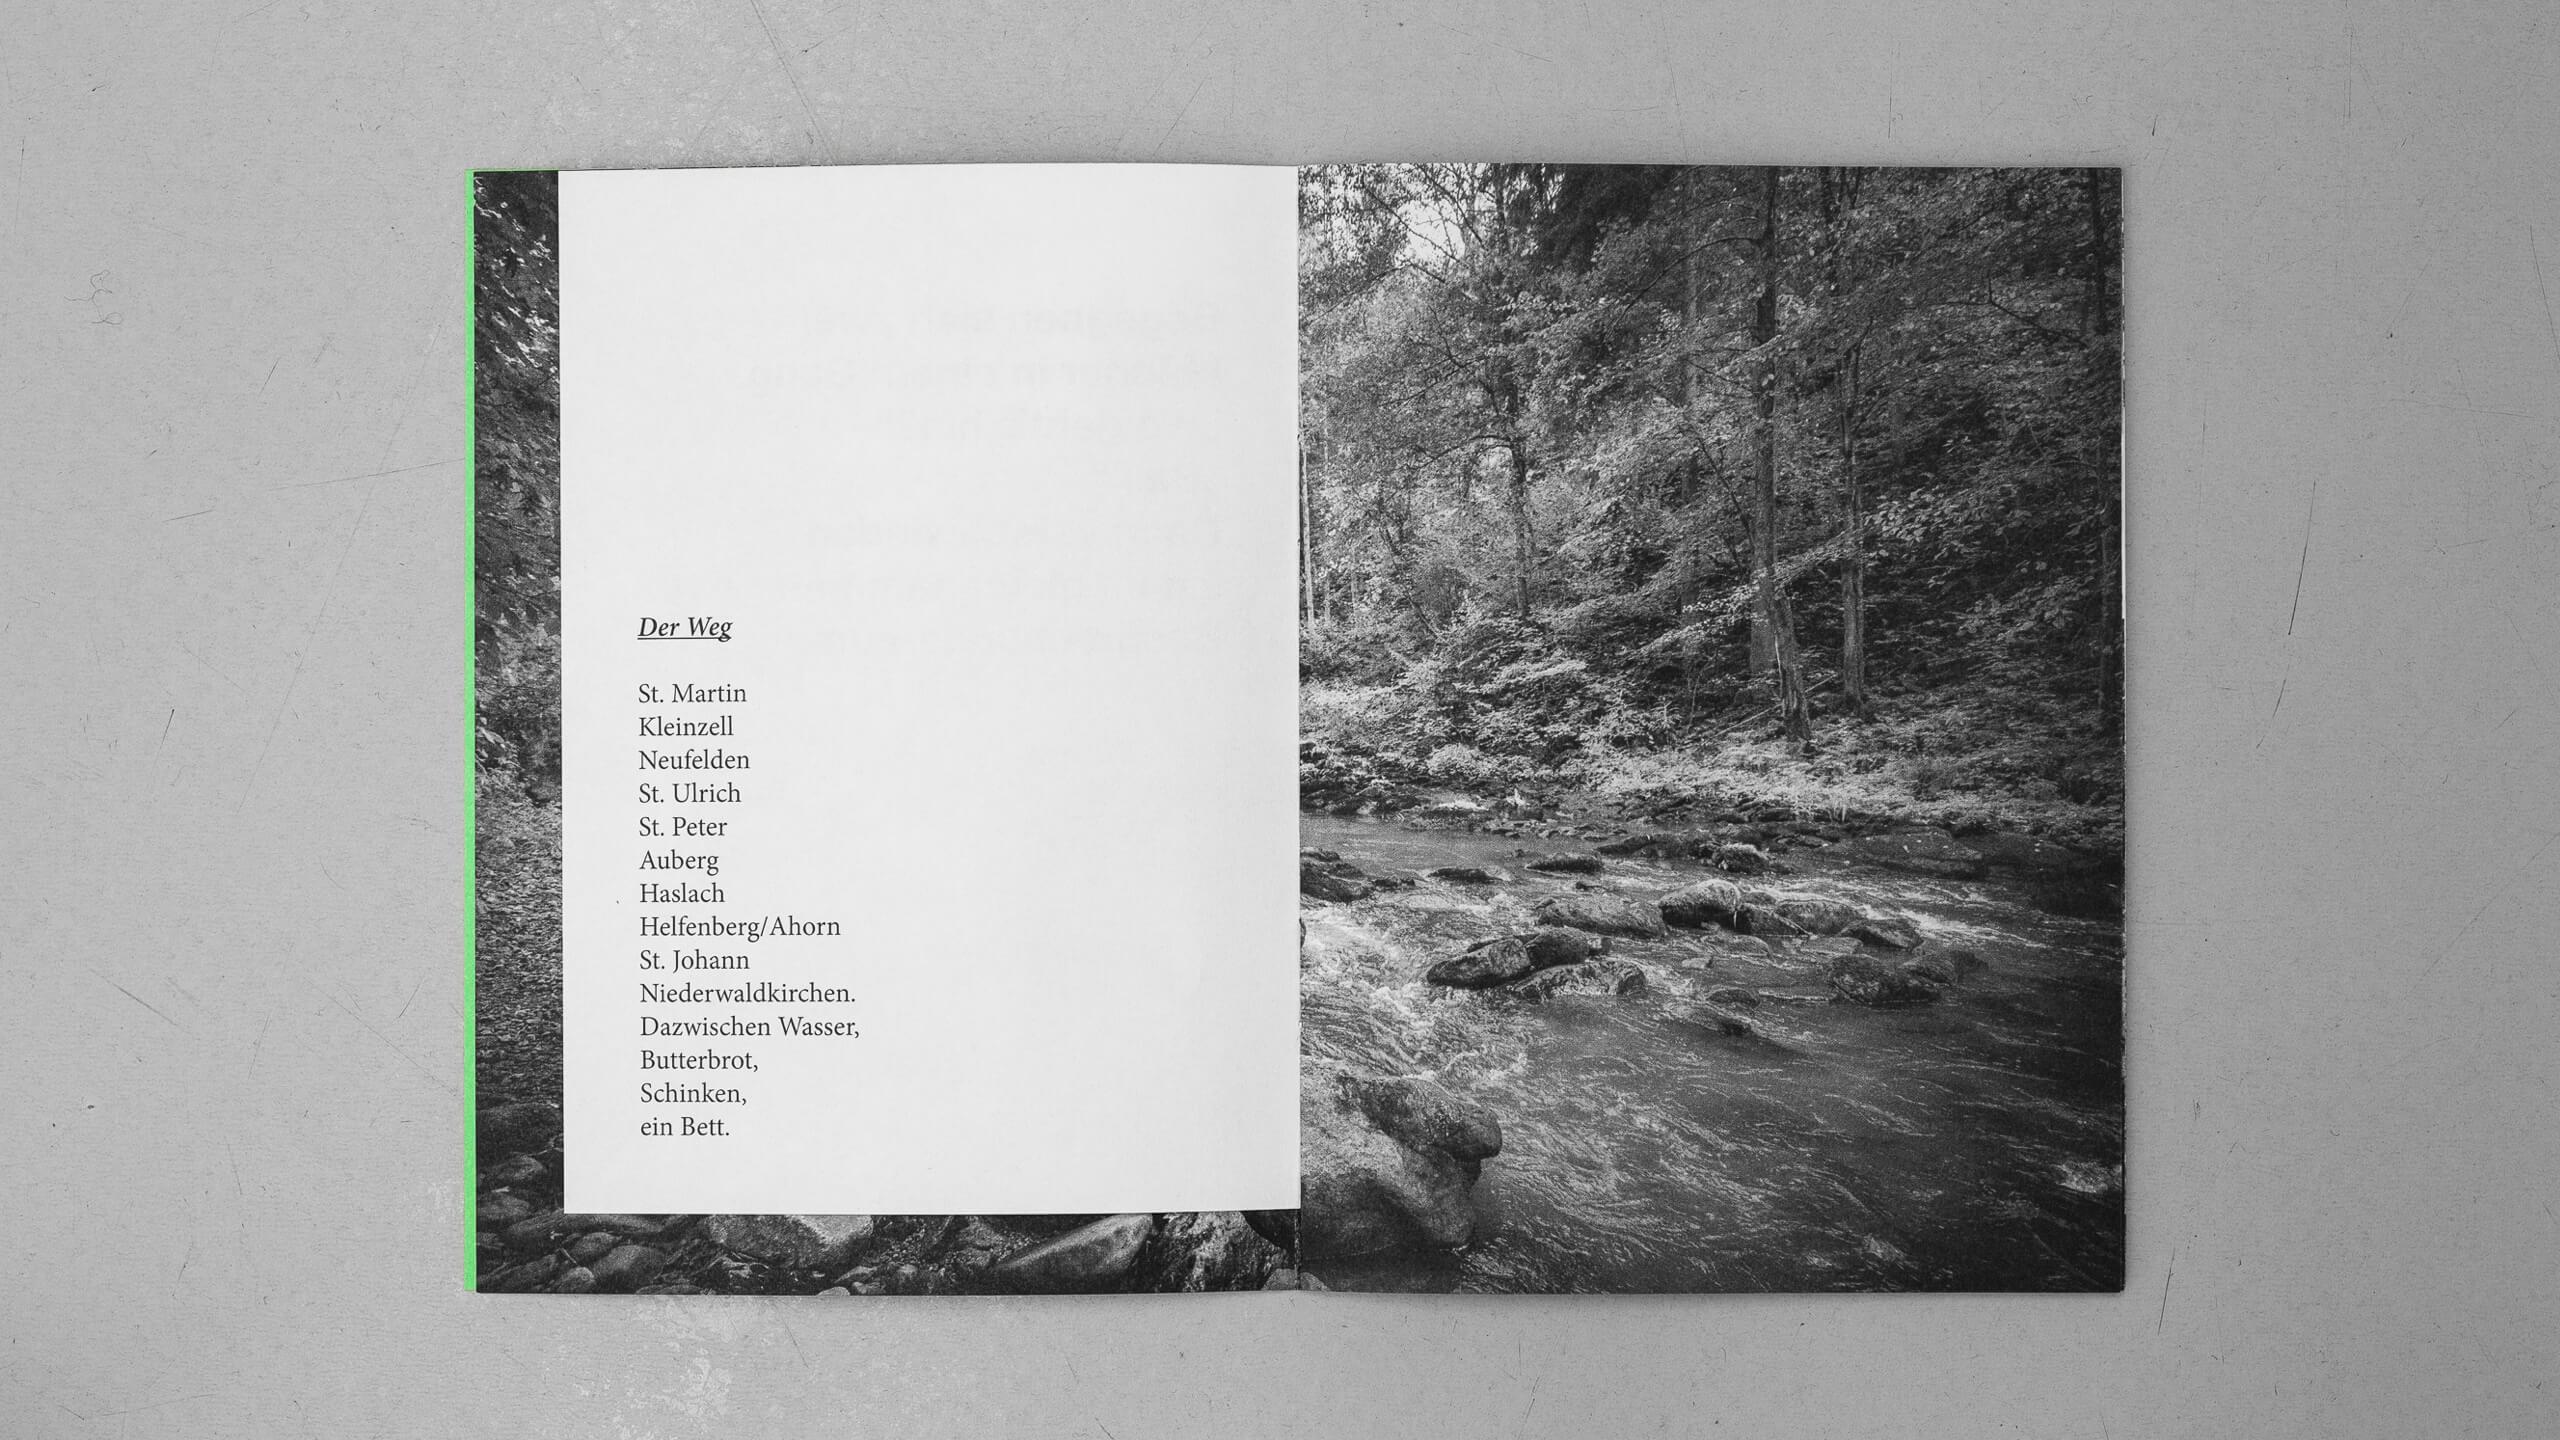 Ref Granit Stempelpass Seiten 02 2560X1600